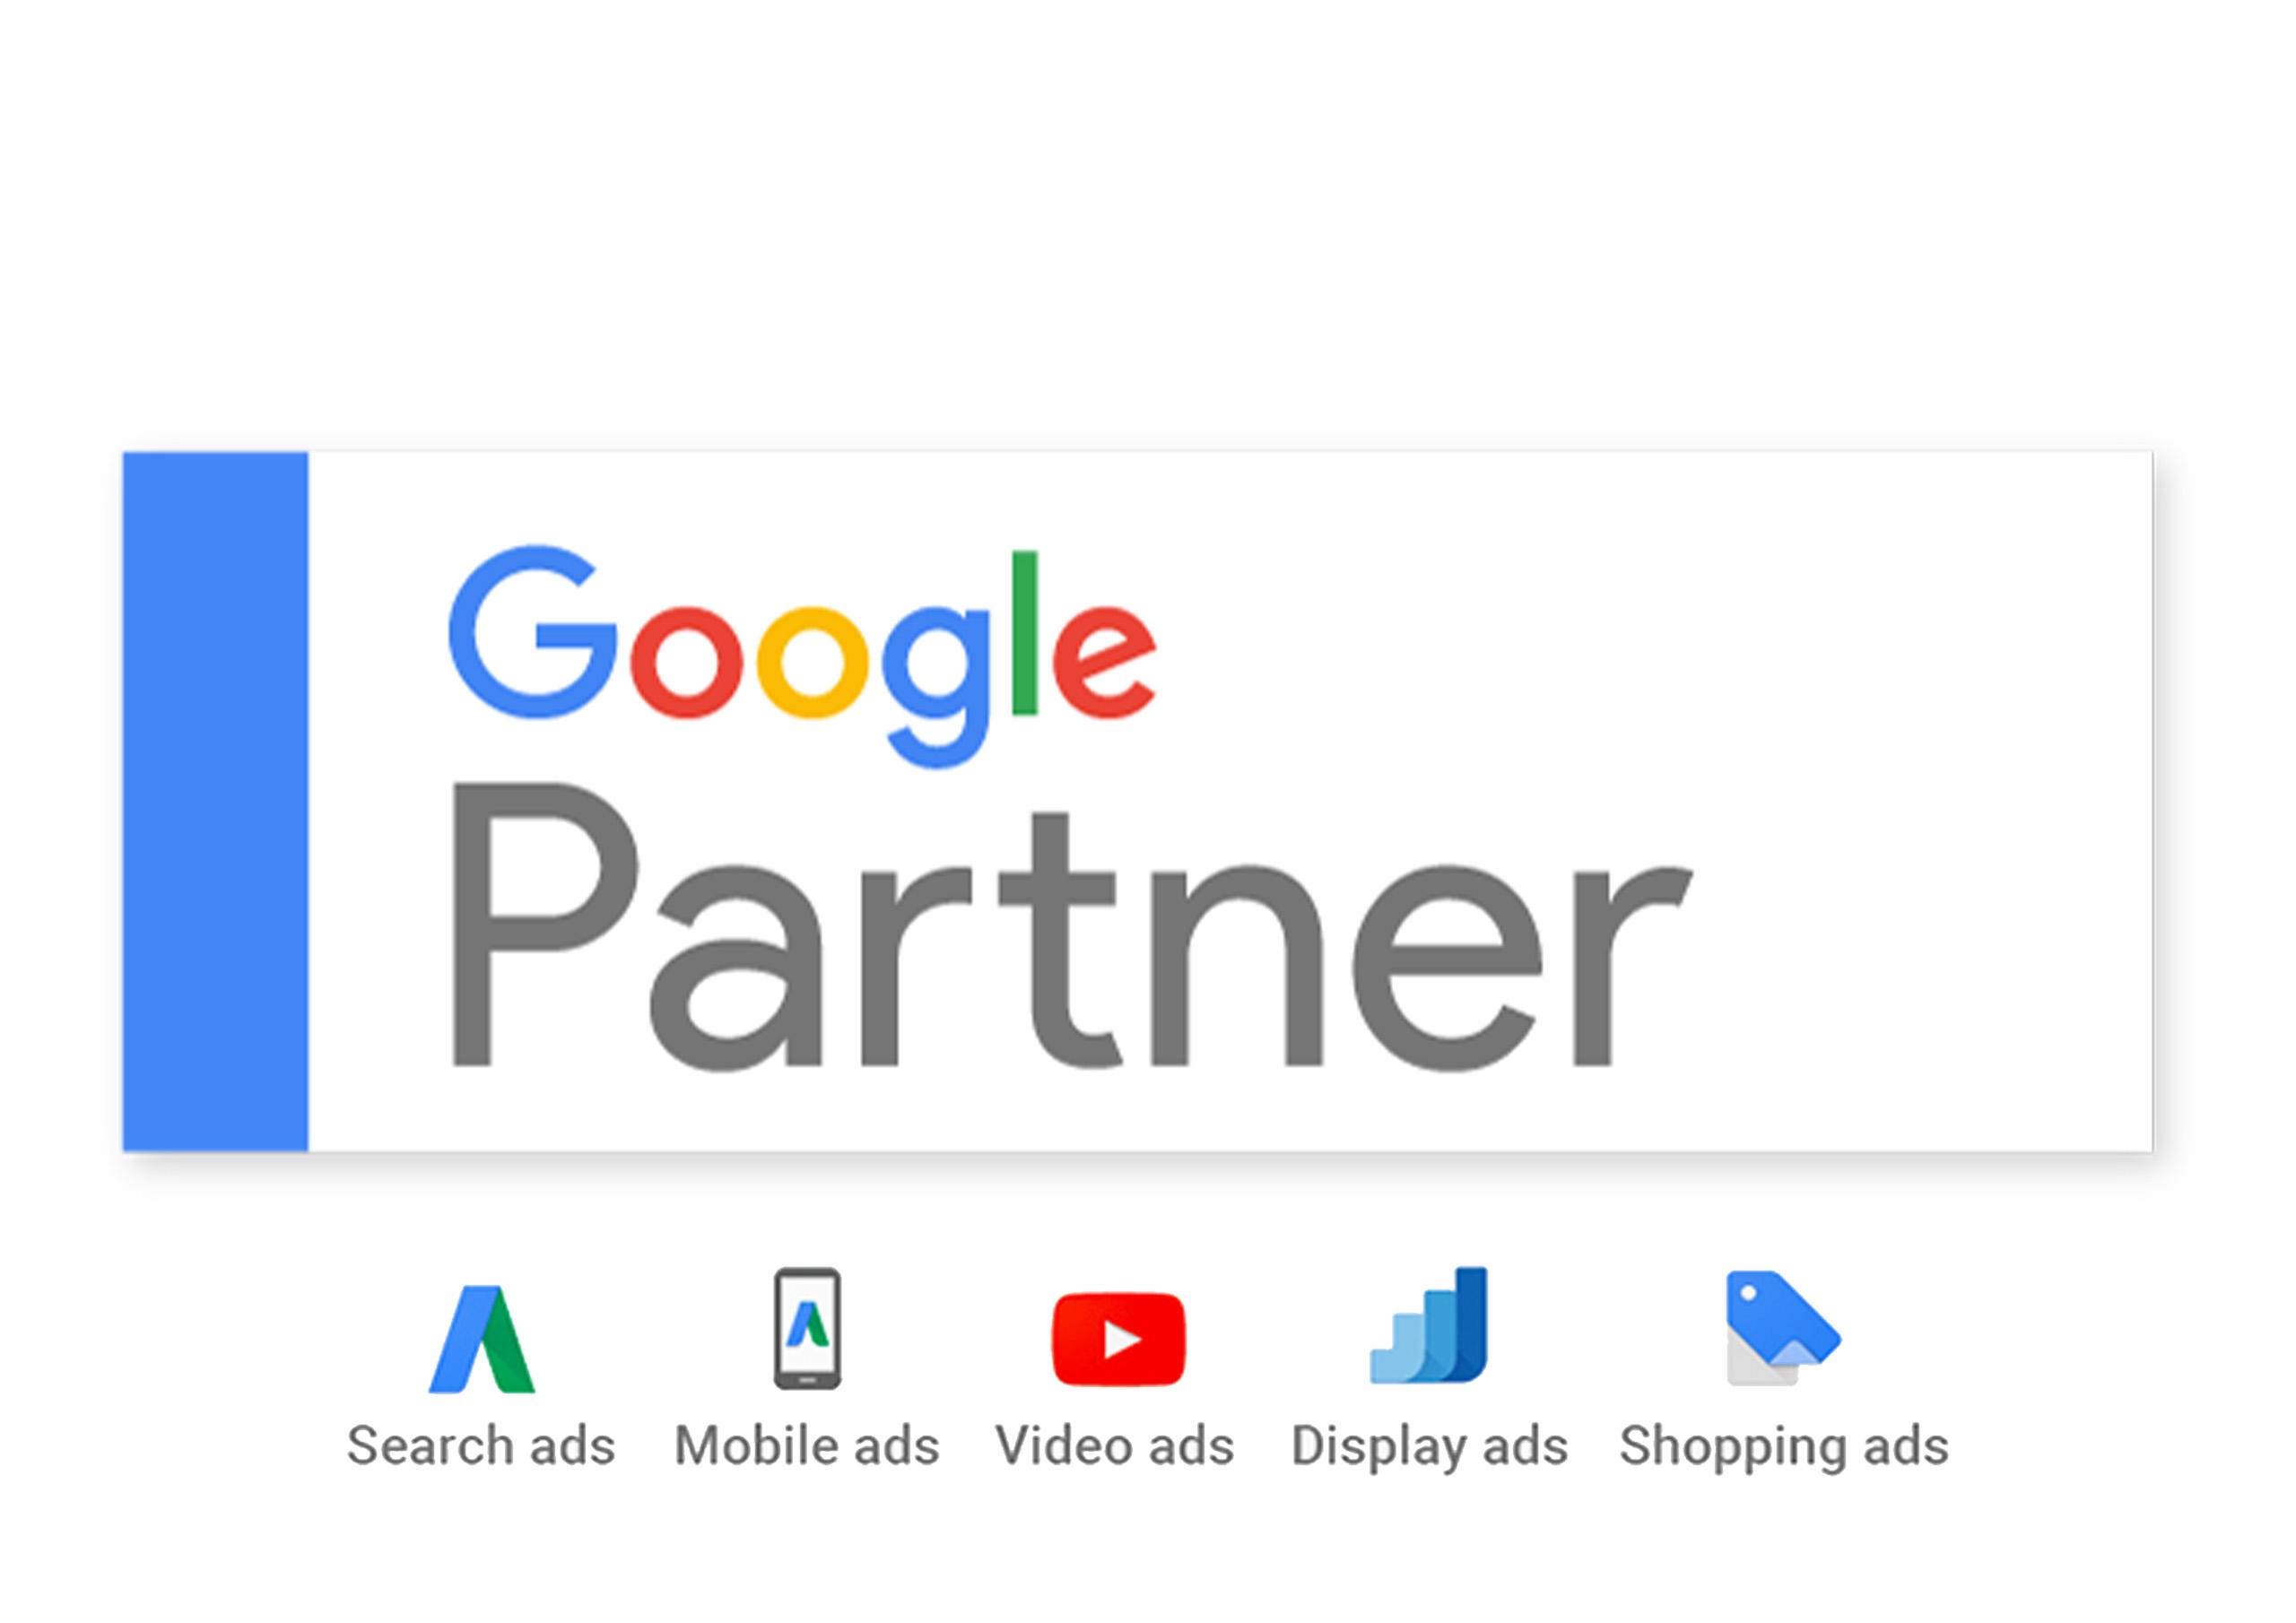 Google Partner Agentur Perner